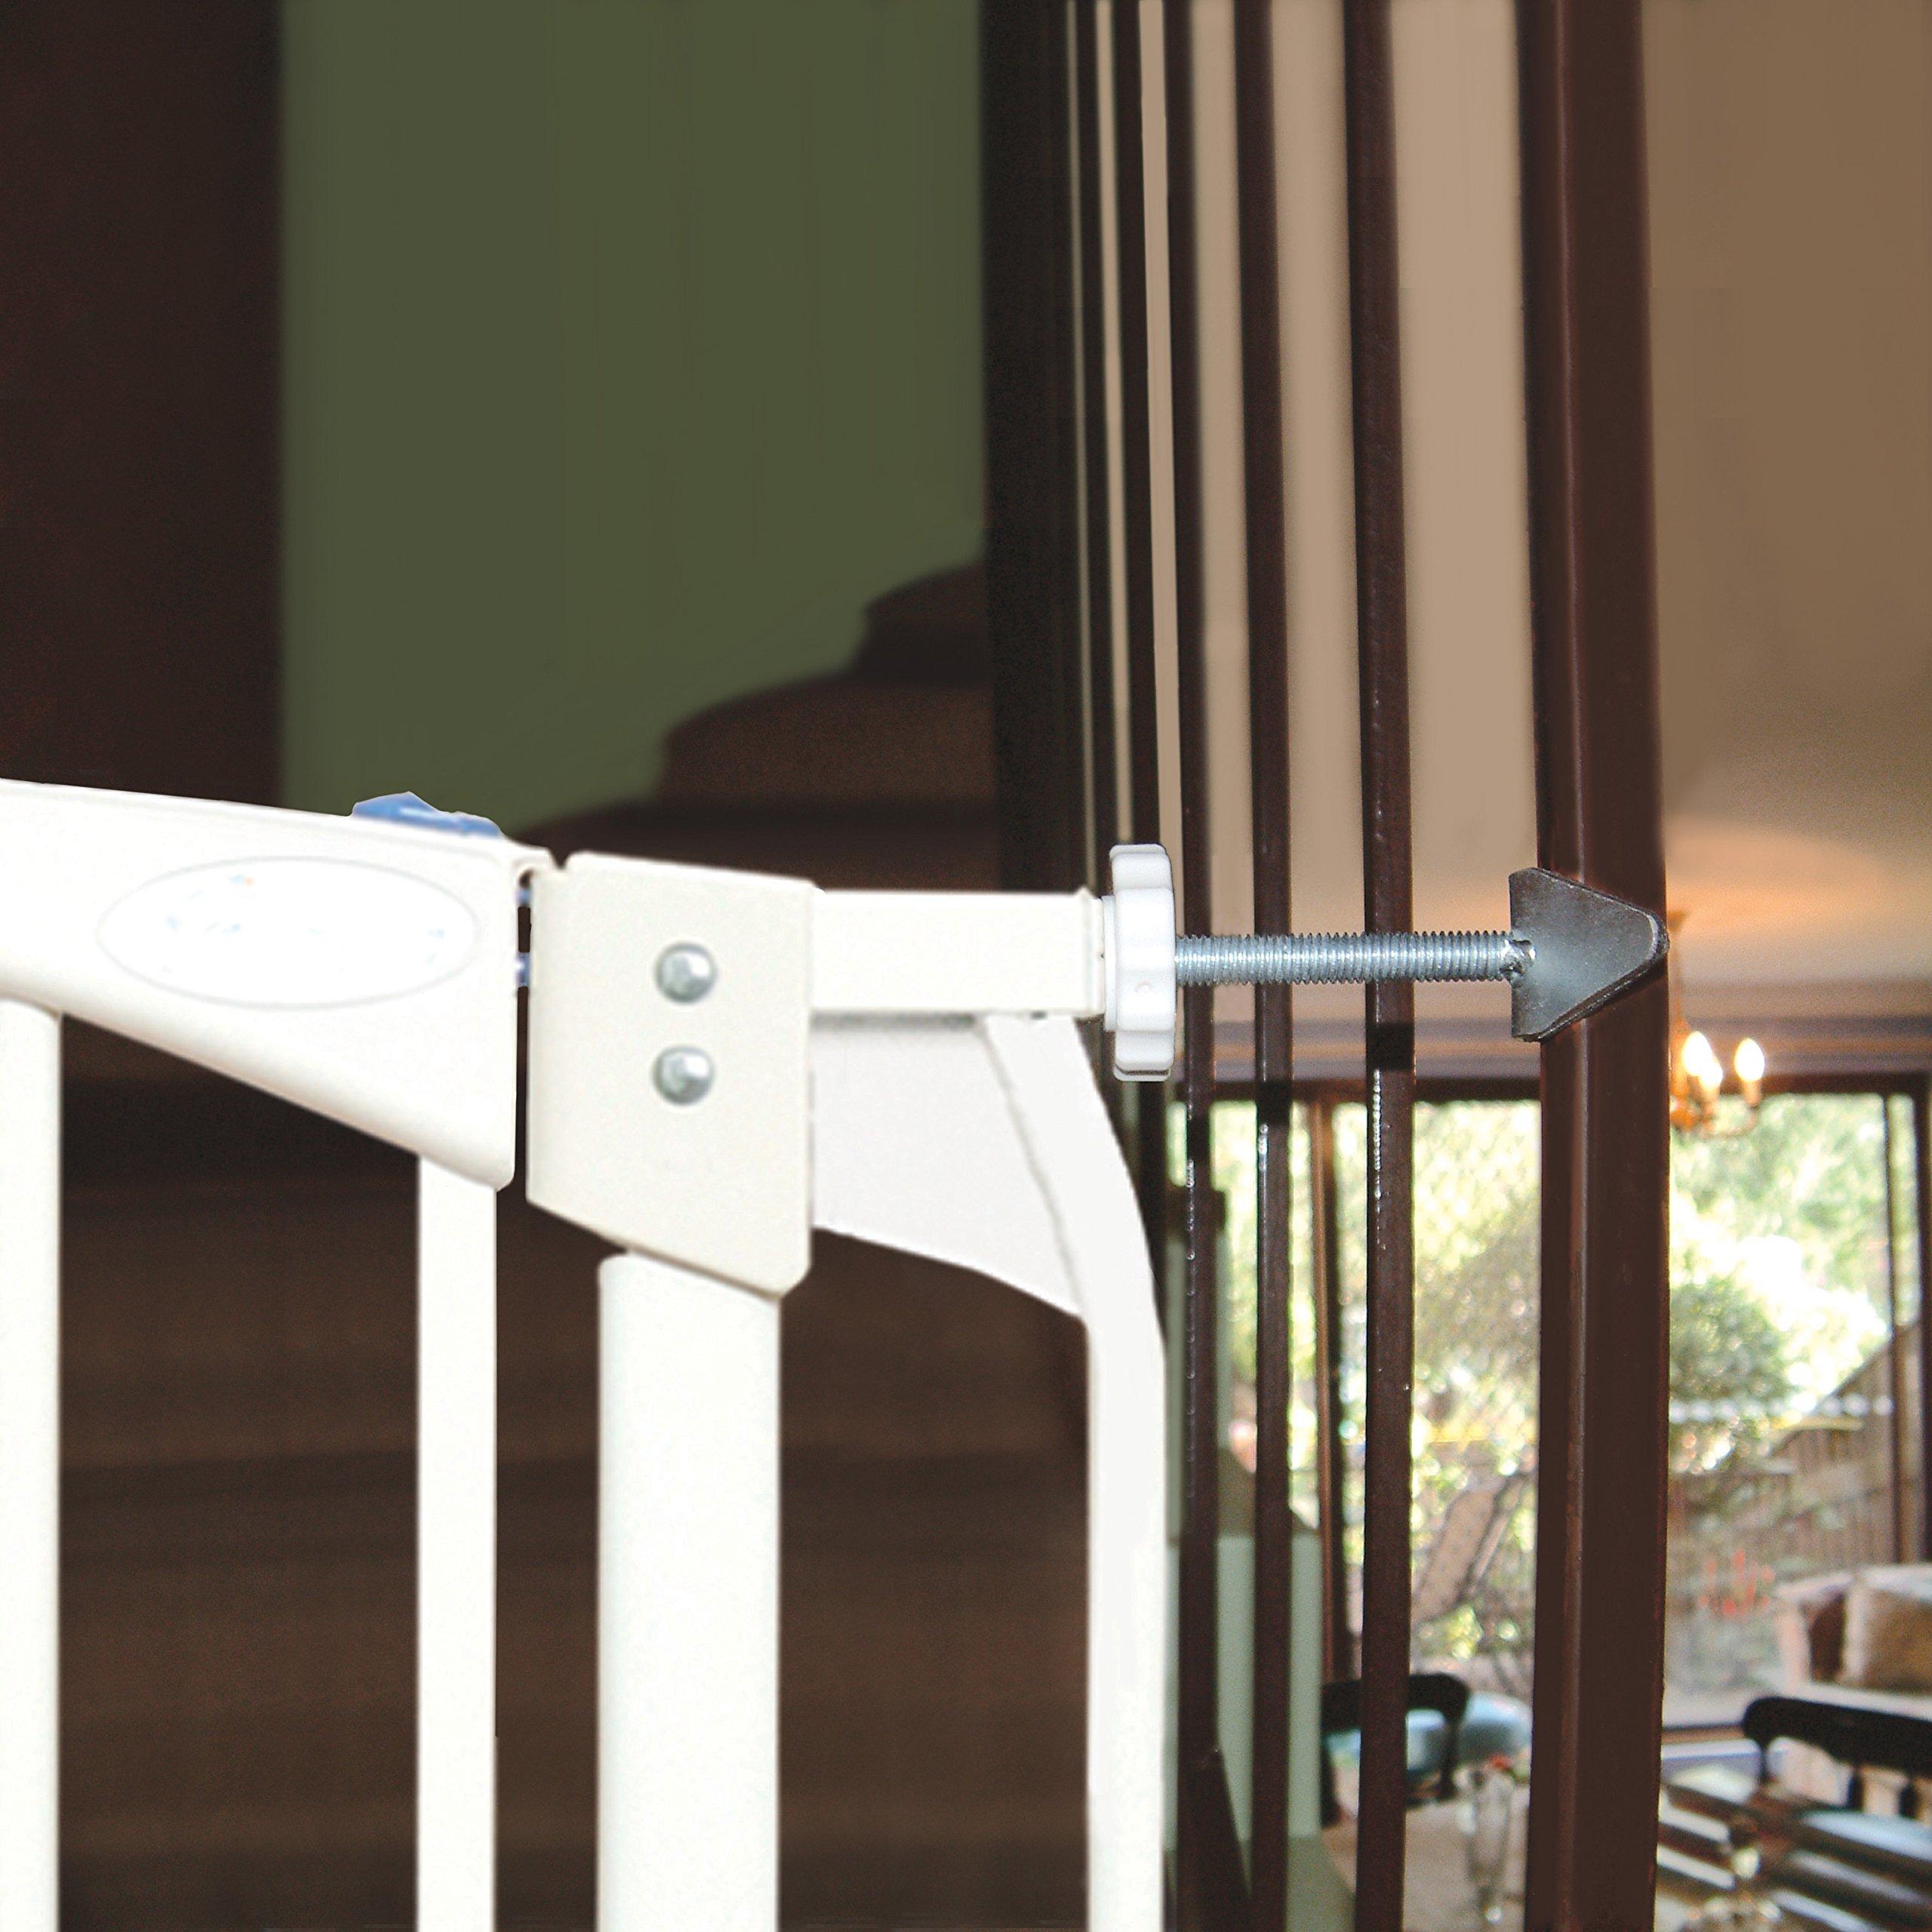 Amazon.com : Dreambaby Chelsea Auto Close Security Gate In